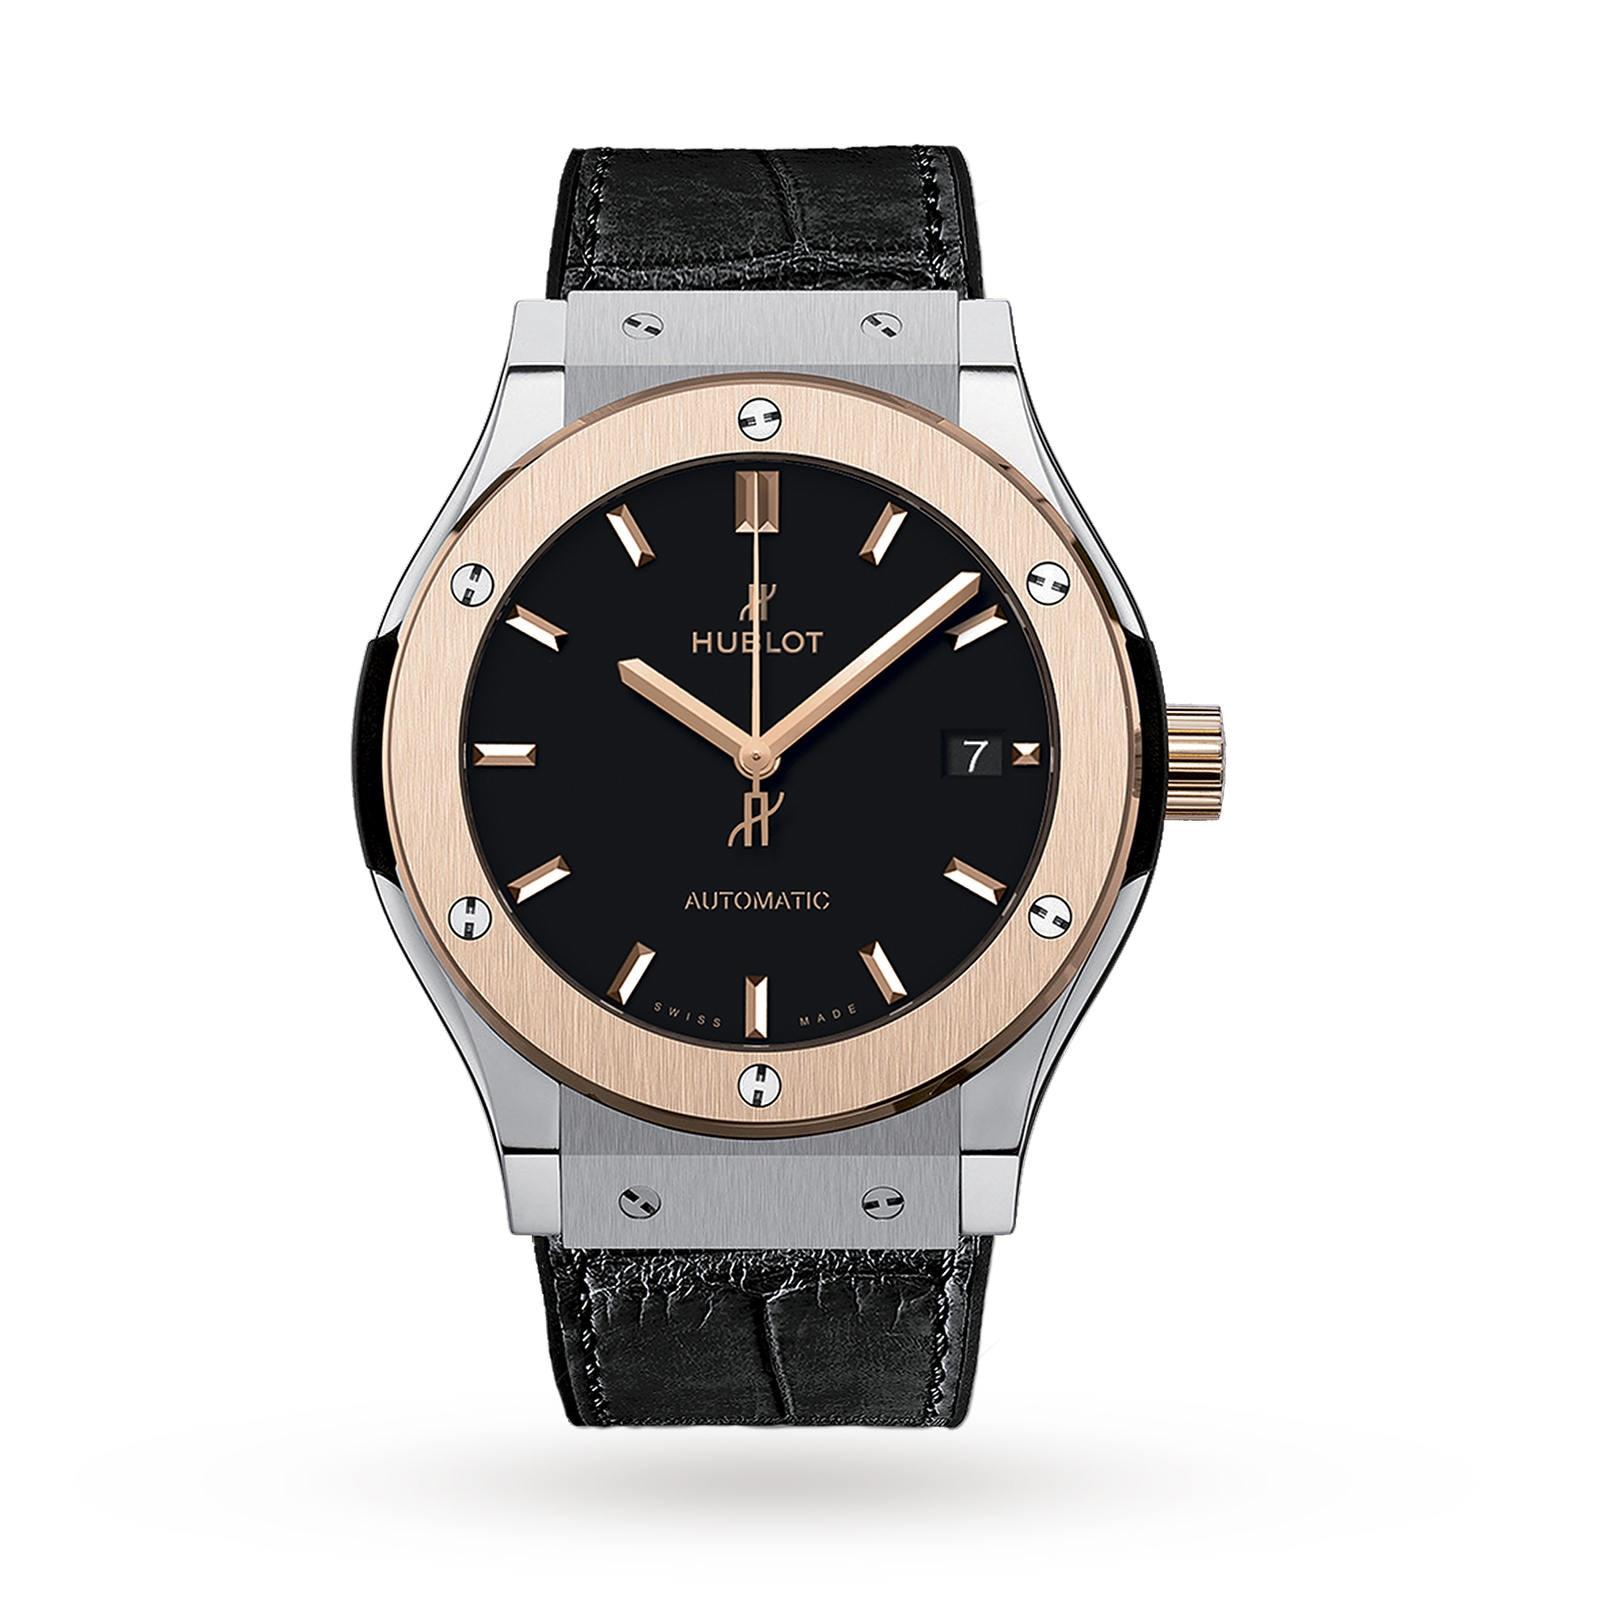 Hublot Hublot Classic Fusion Titanium King Gold 45mm Mens Watch